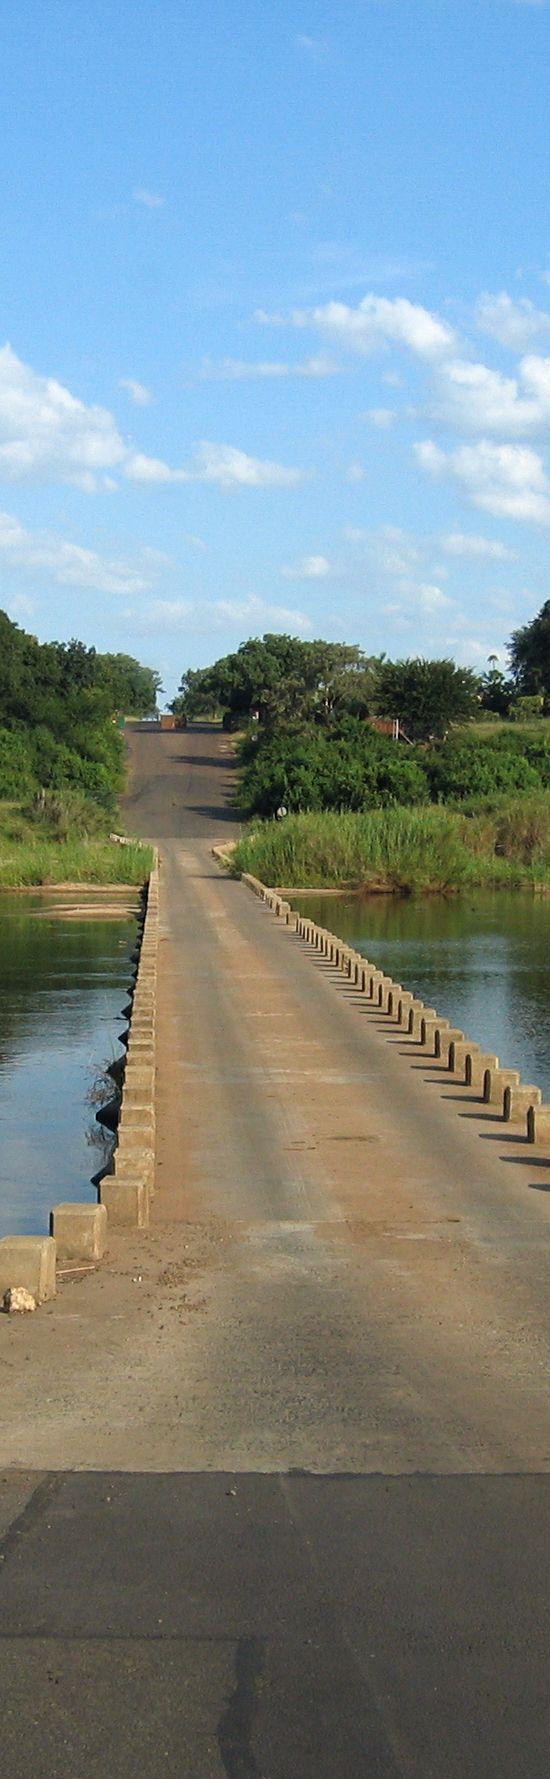 Crocodile Bridge to Kruger National Park -One Of largest game reserves- Johannesburg - South Africa   Africa